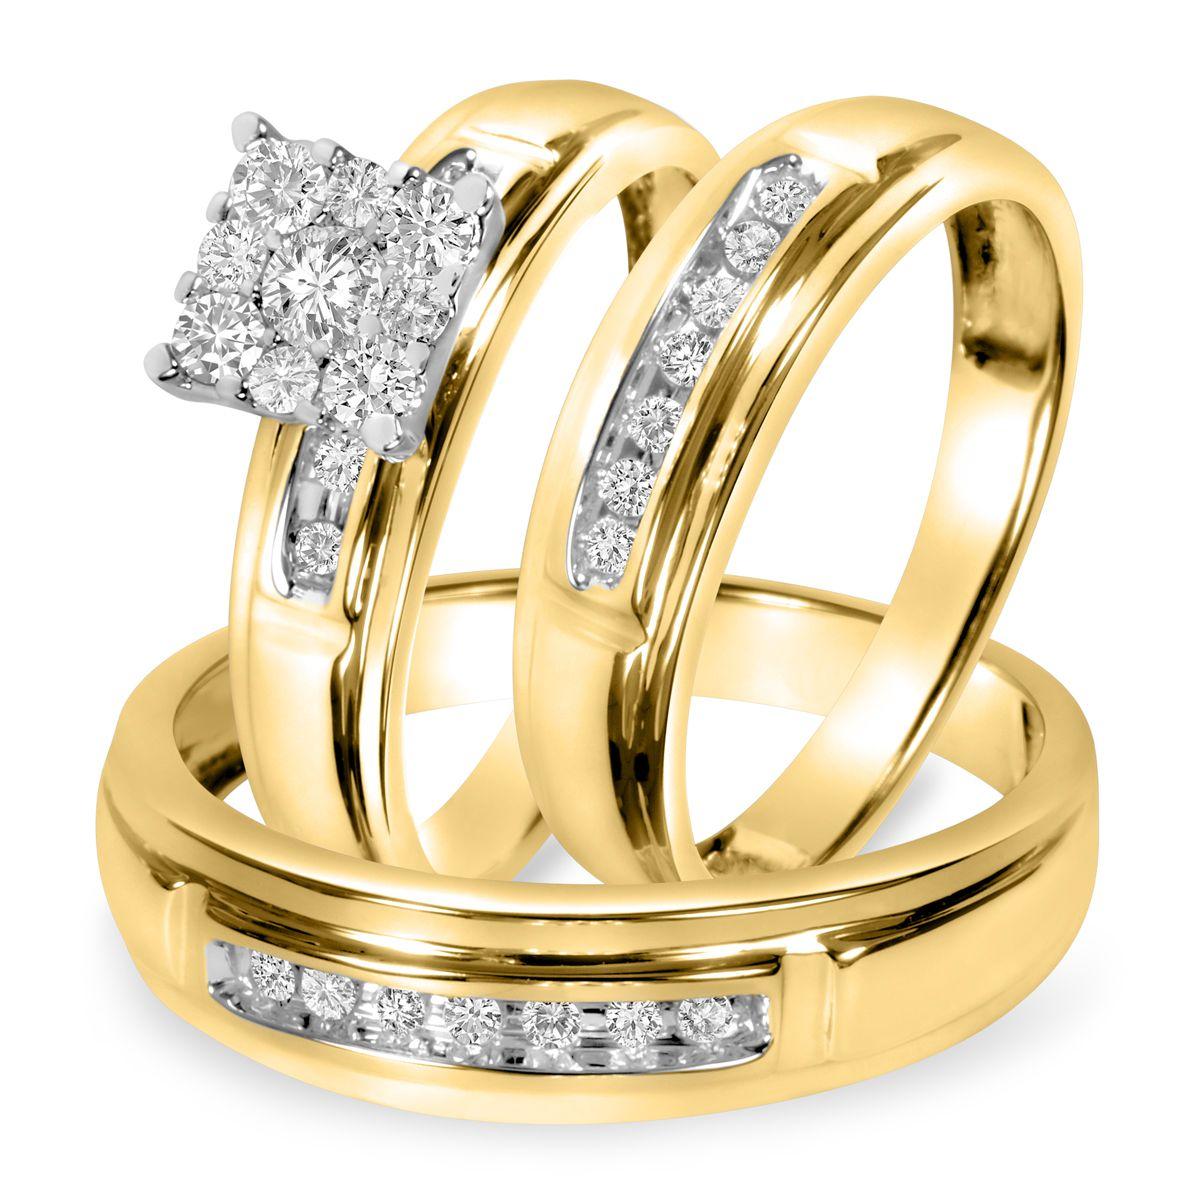 1 2 Ct T W Diamond Trio Matching Wedding Ring Set 14k Yellow Gold Wedding Ring Trio Sets Cheap Wedding Rings Sets White Gold Wedding Ring Set